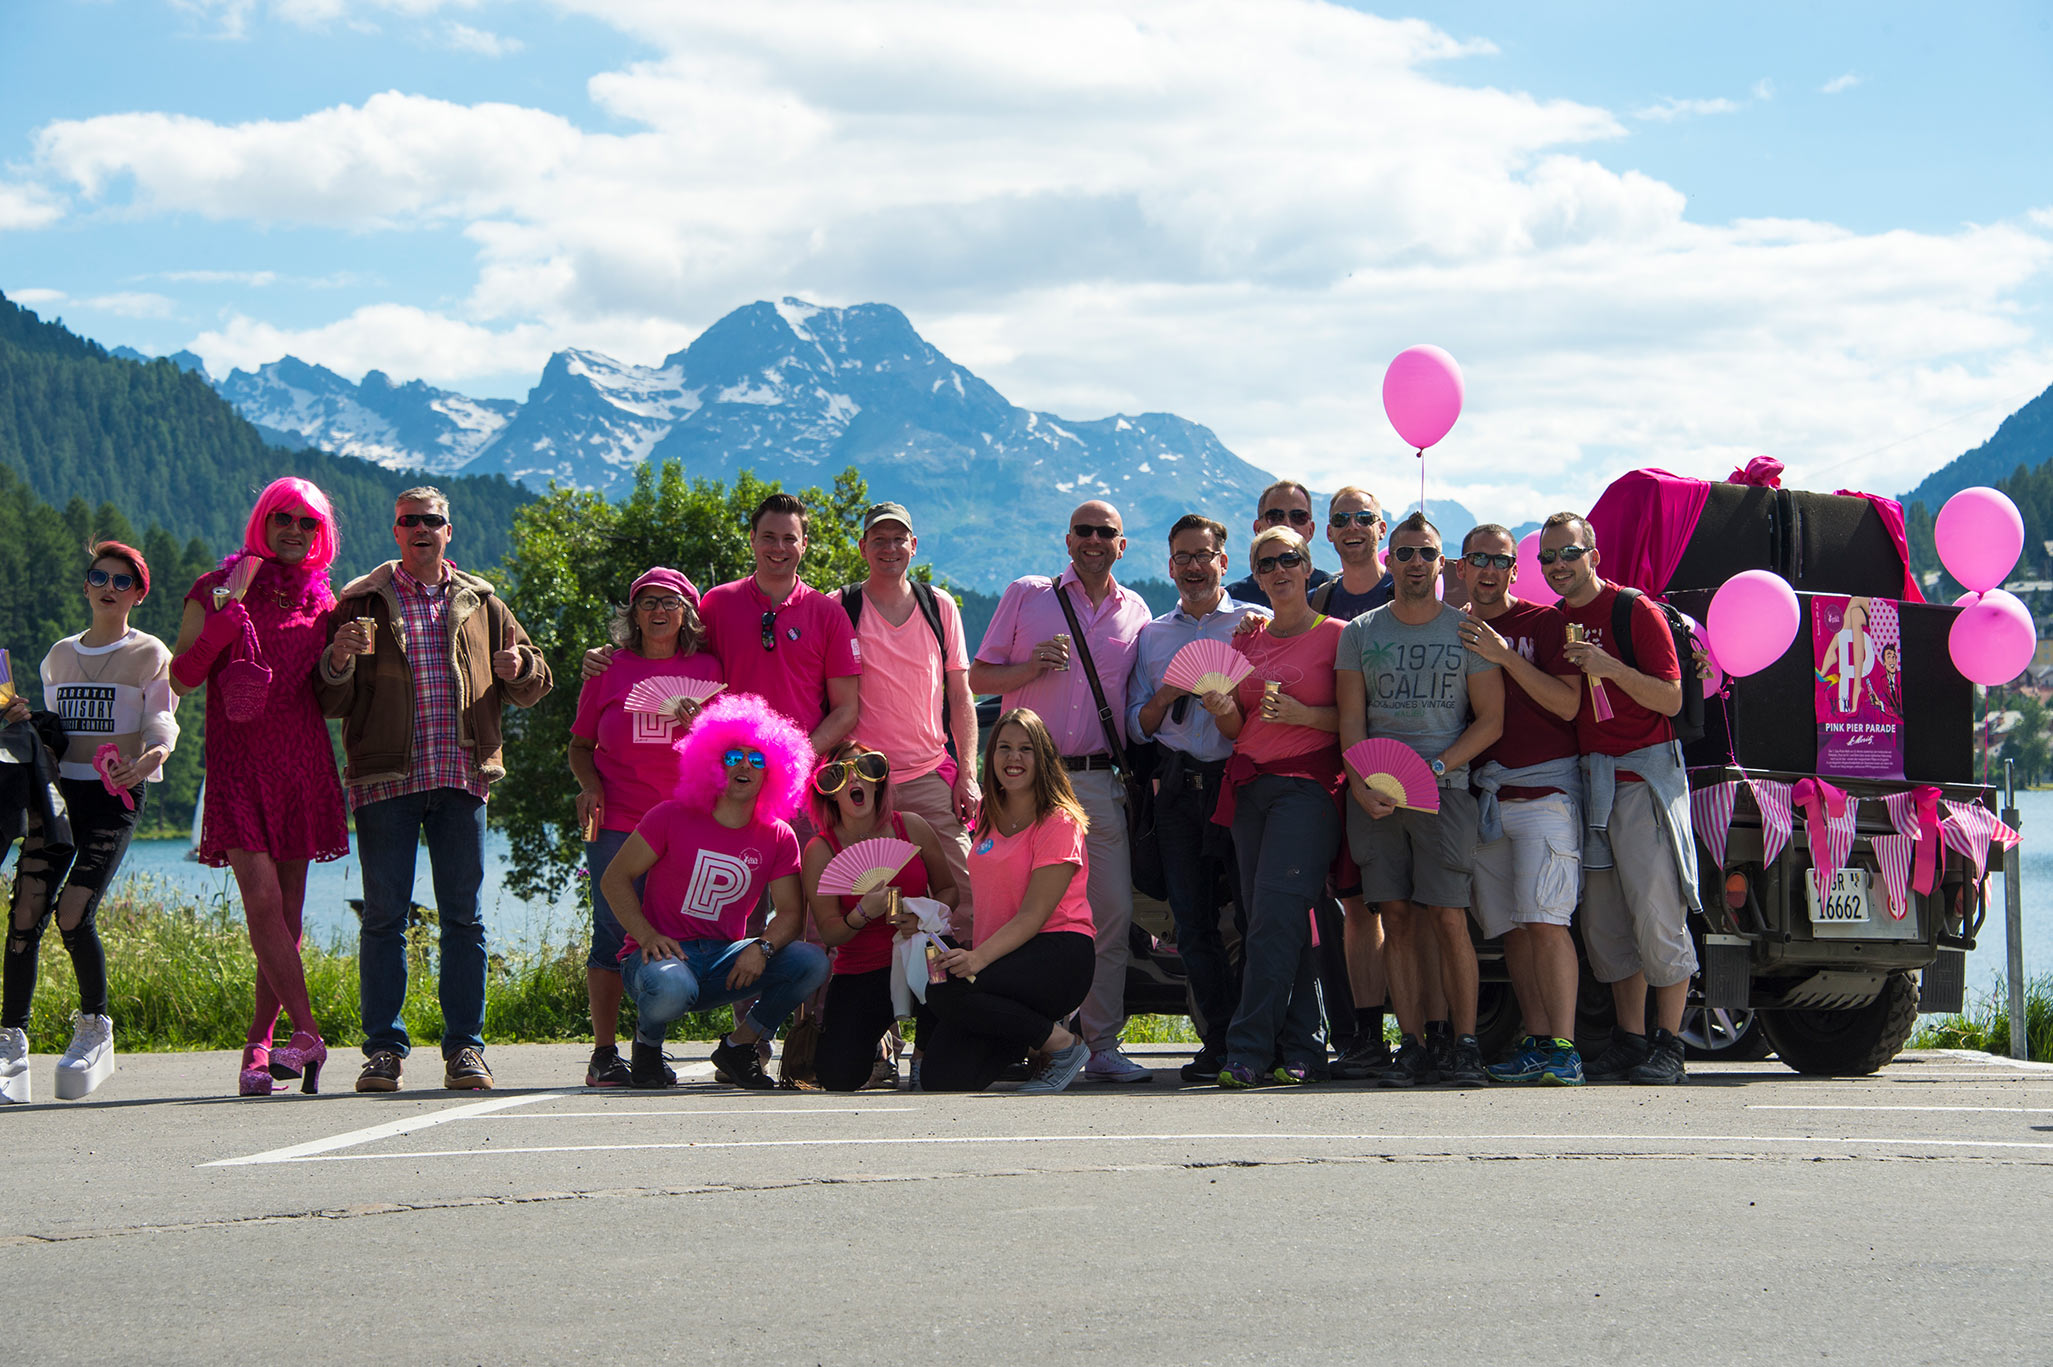 pink-pier-parade-2016-lovemobil-start-gruppe.jpg